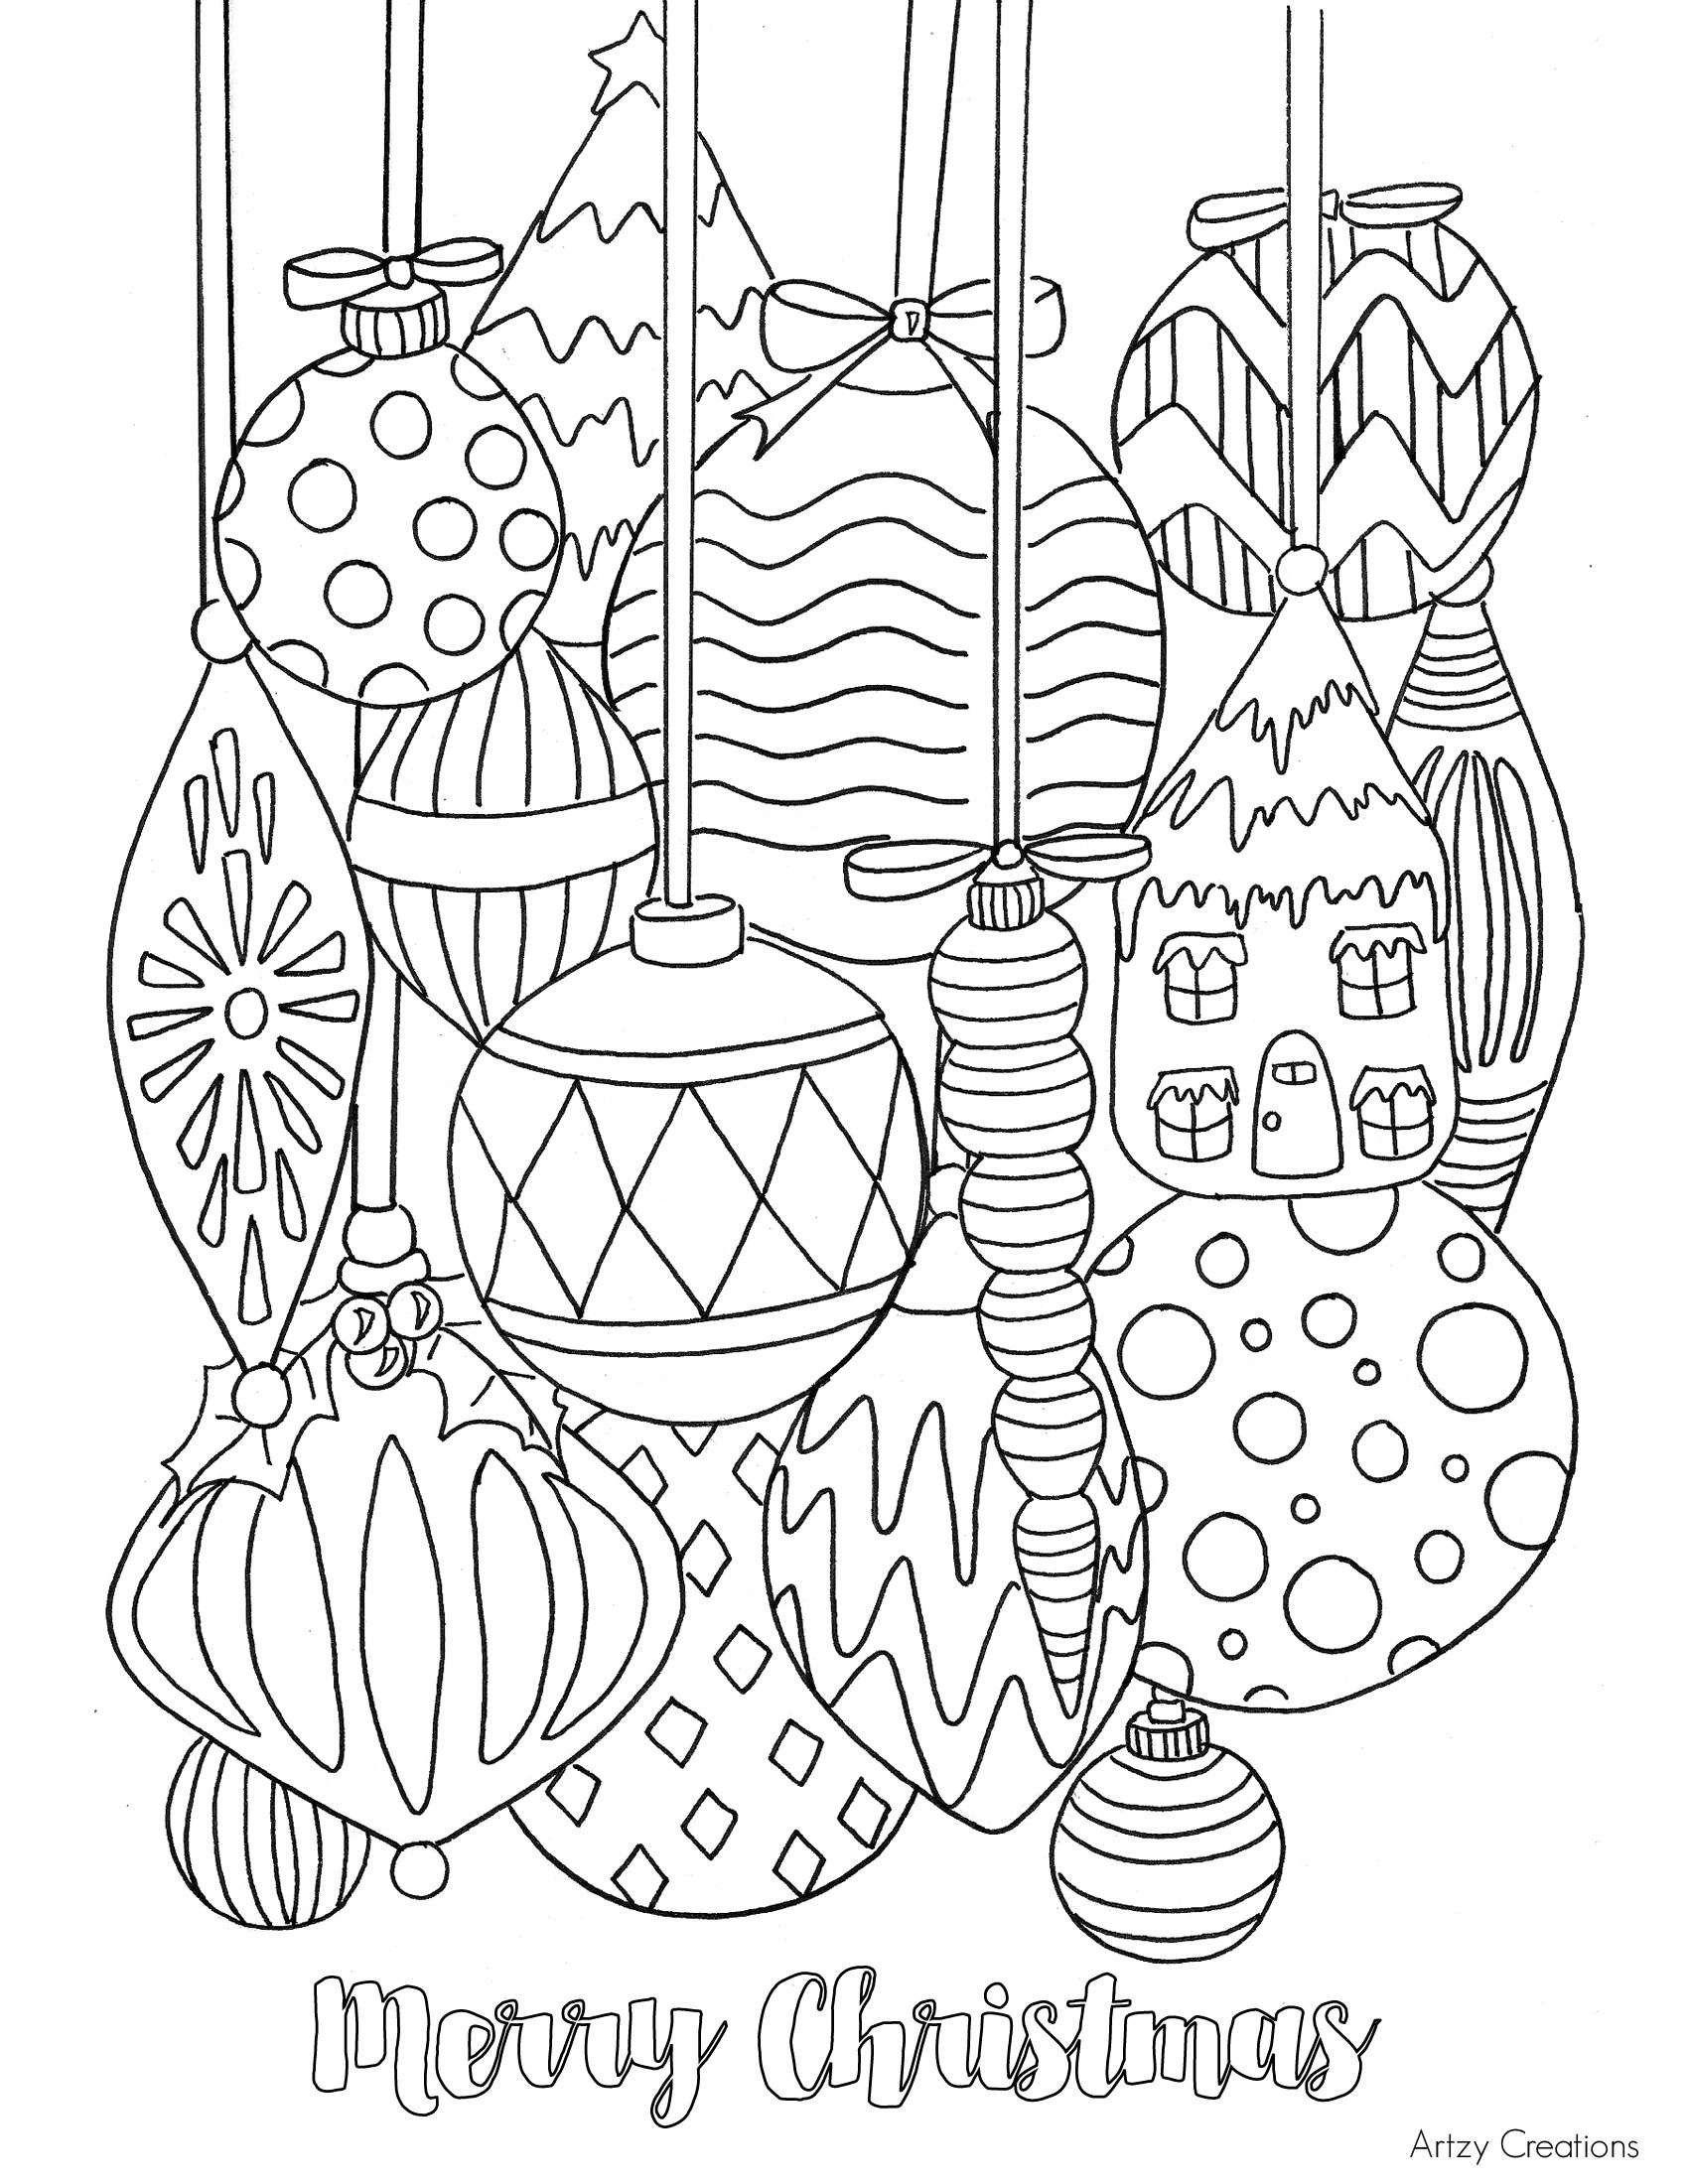 5 Worksheet Coloring Worksheets Middle School Coloring